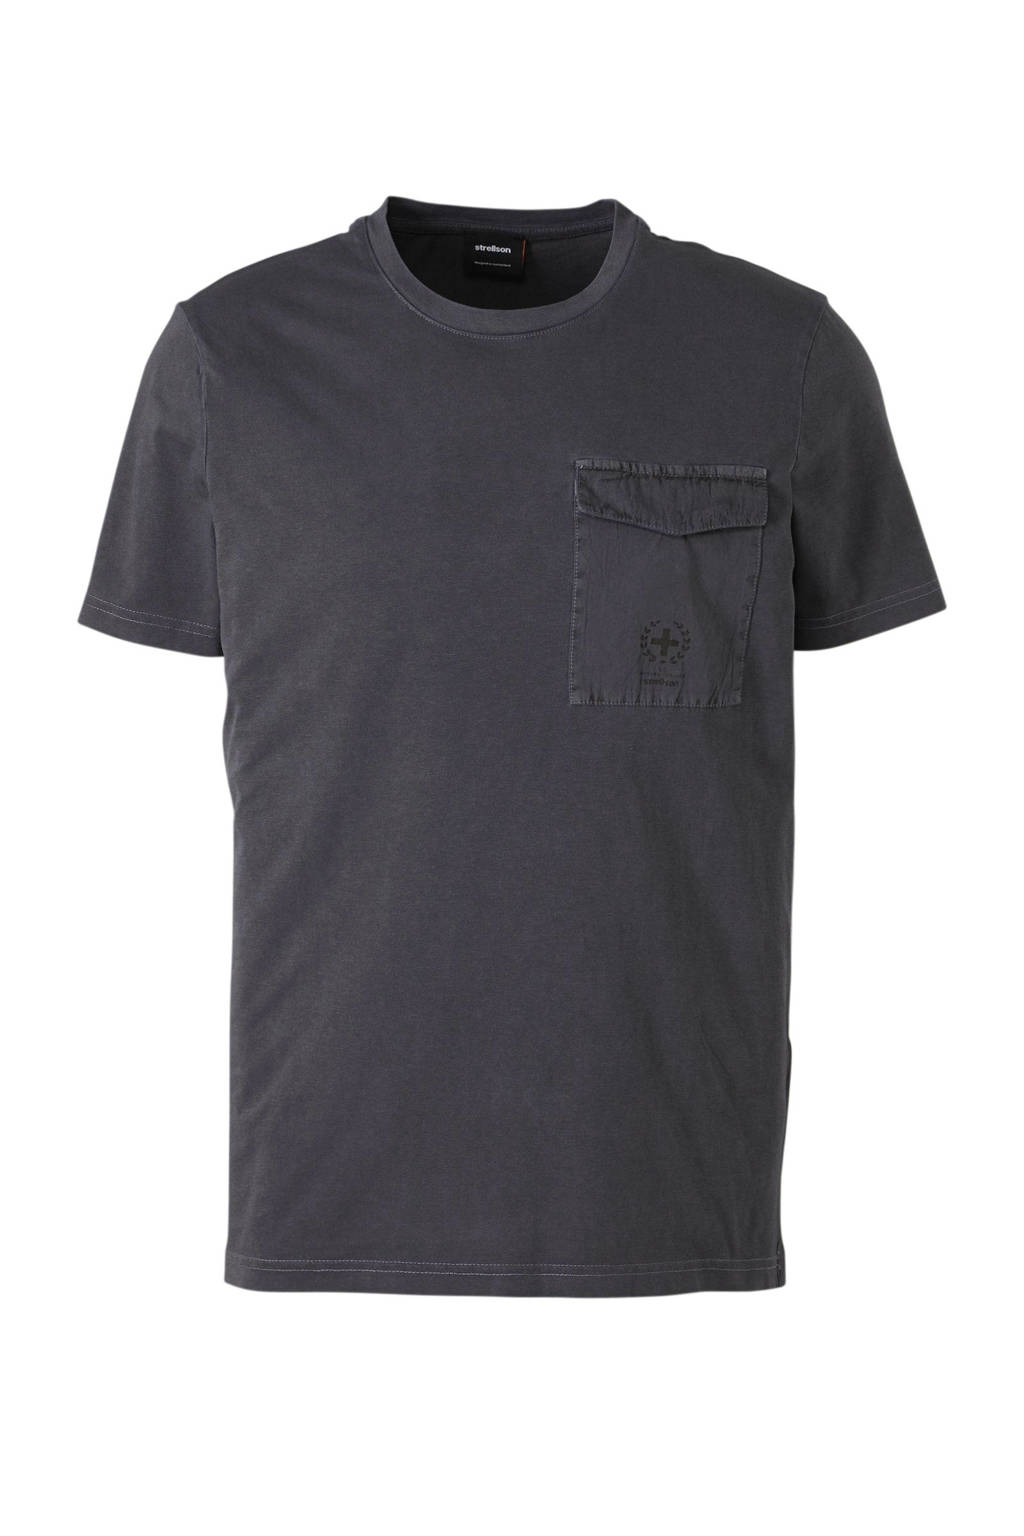 Strellson T-shirt antraciet, Antraciet